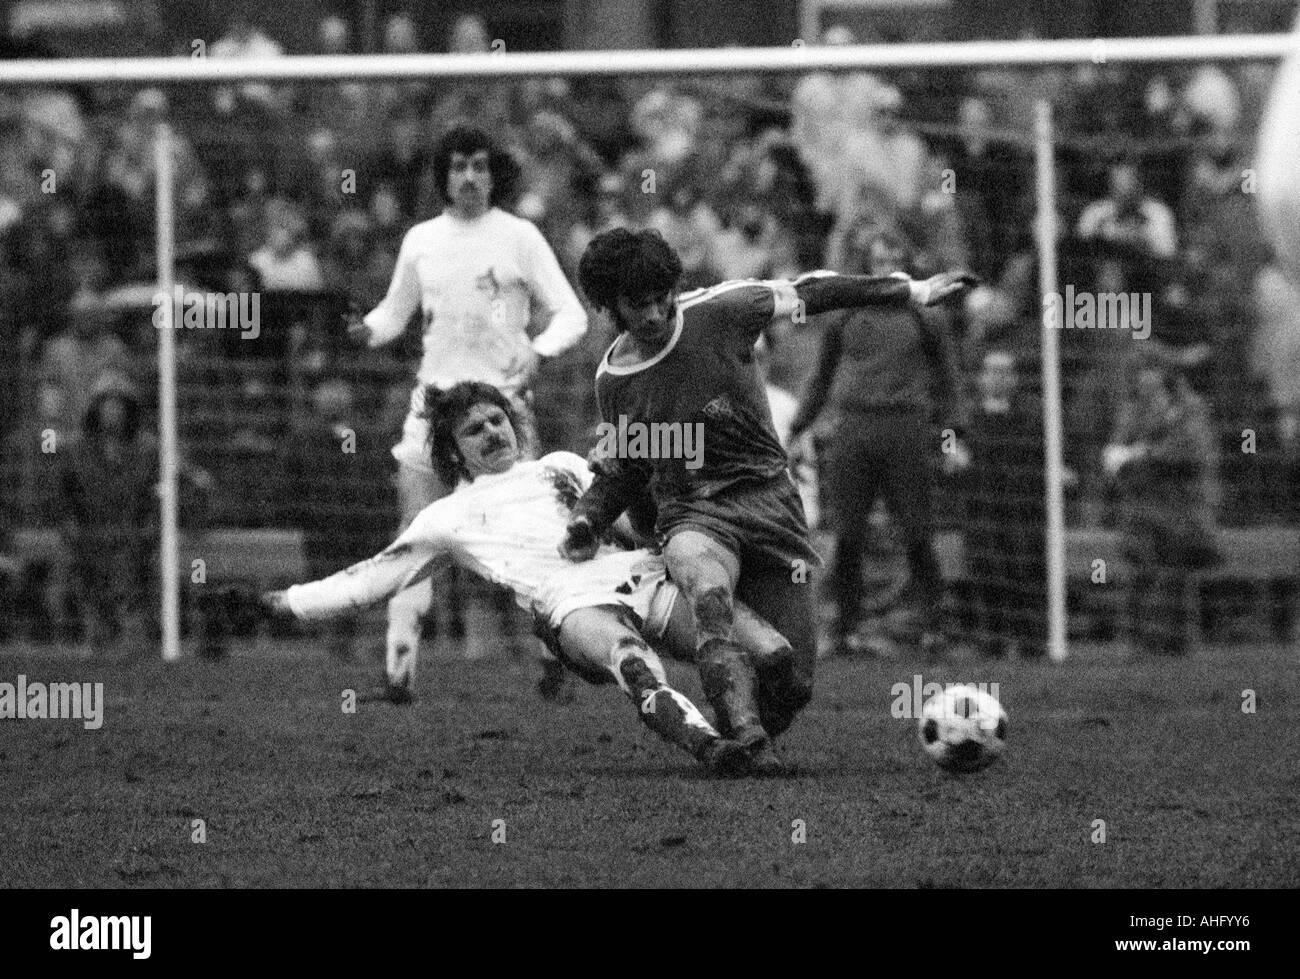 football, Bundesliga, 1973/1974, VfL Bochum versus 1. FC Cologne 0:2, Stadium at the Castroper Strasse in Bochum, Stock Photo